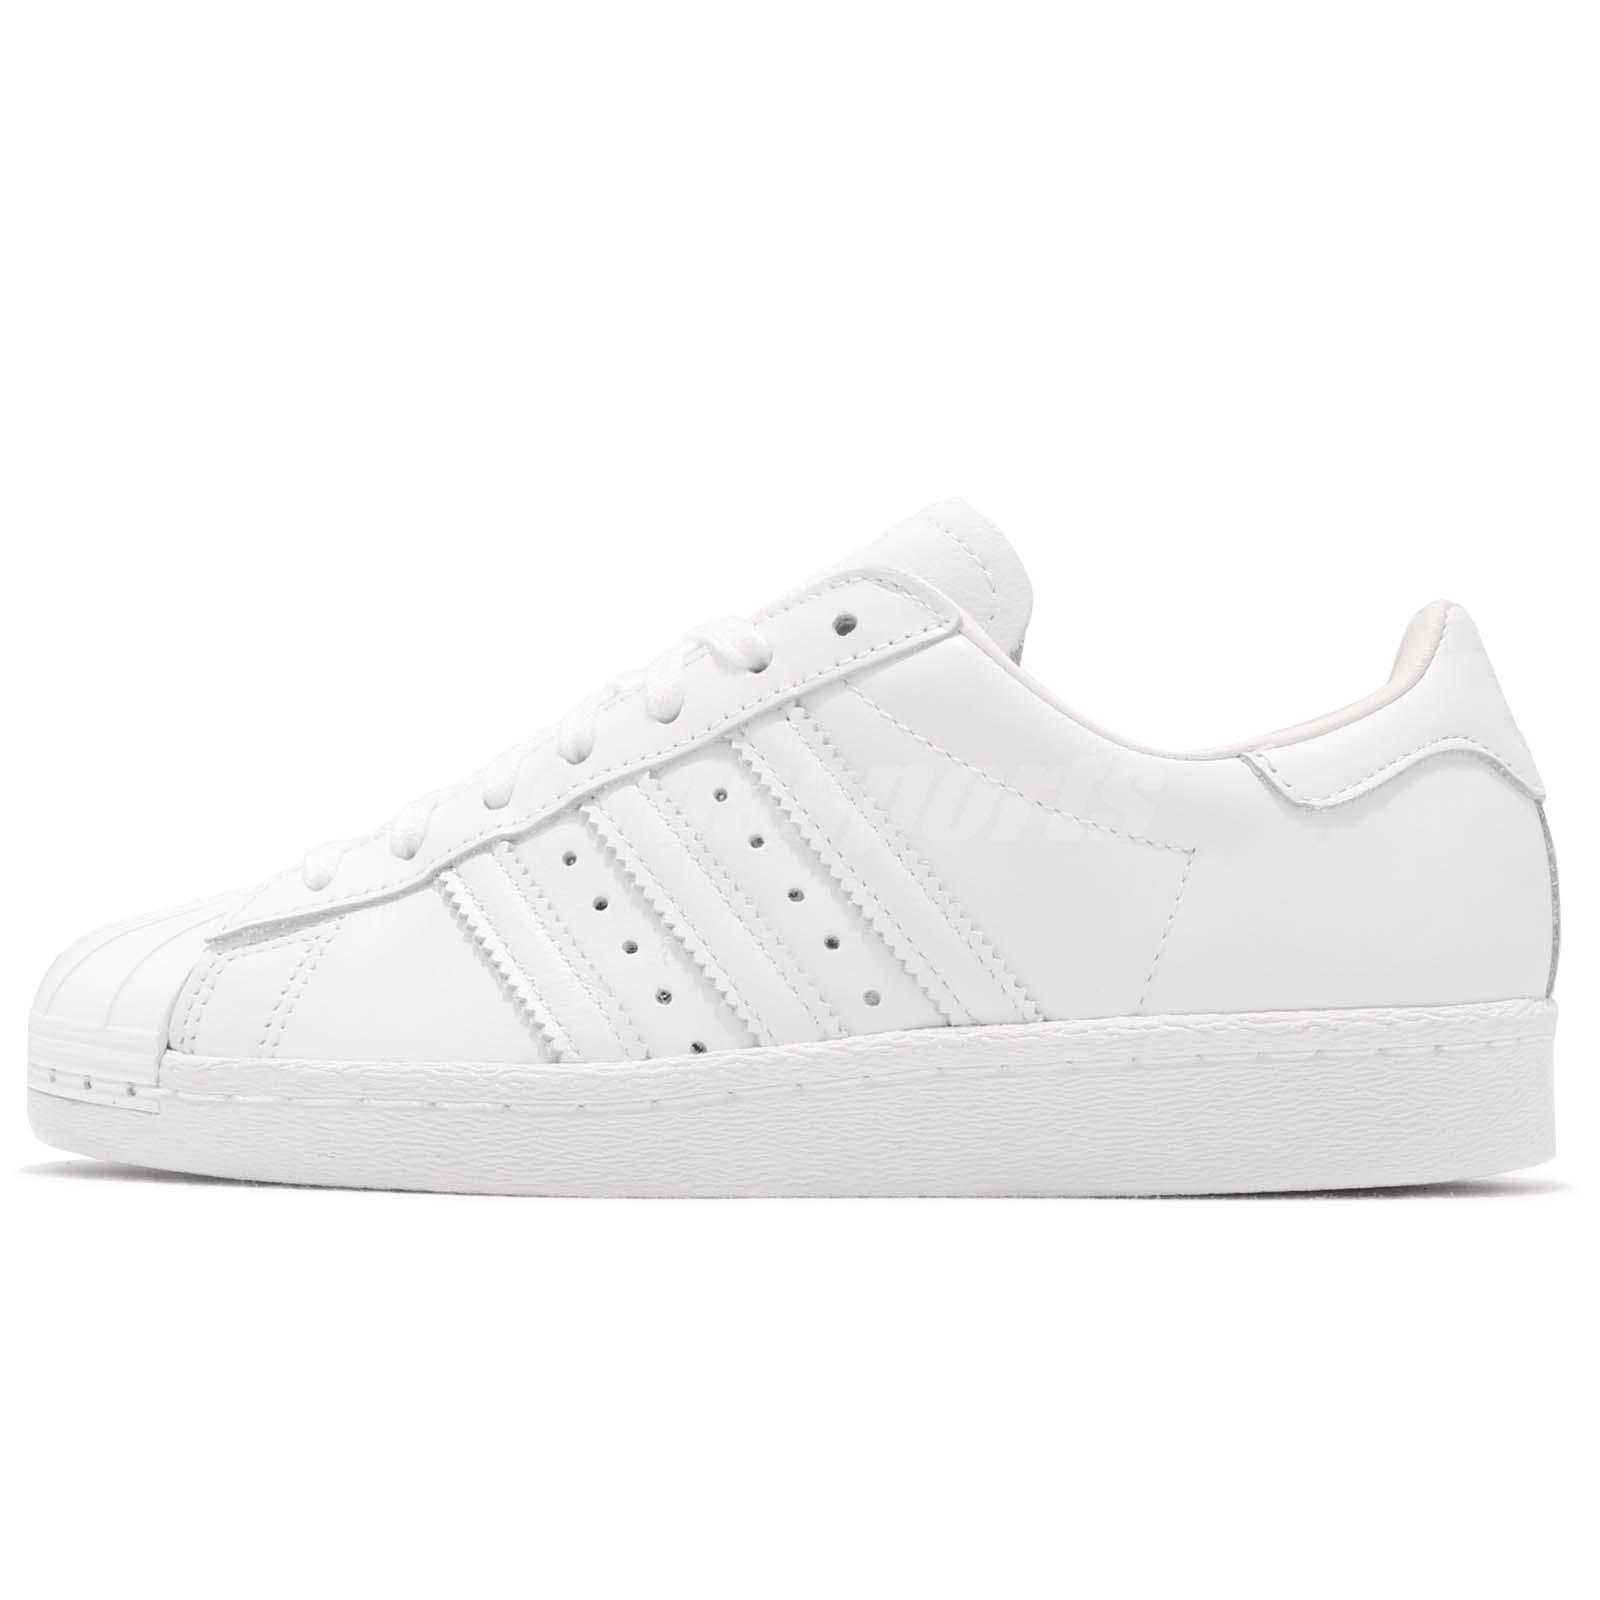 pretty nice 6586d 936e6 adidas Originals Superstar 80s Metal Toe W White Women Casual Shoes S76540